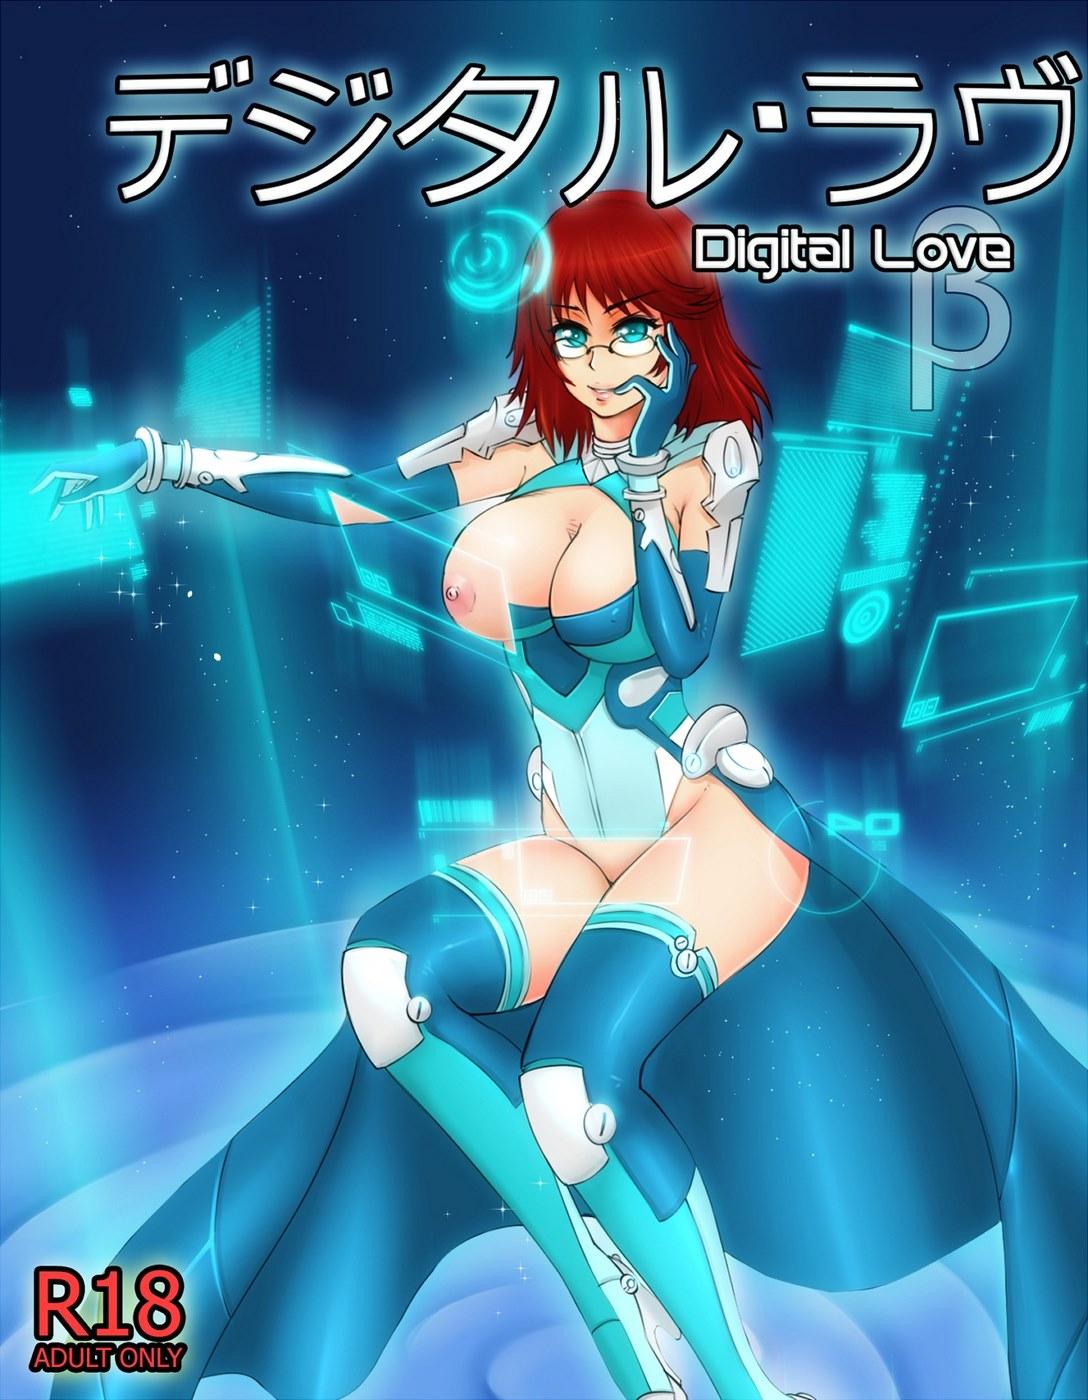 Magnifire- Digital Love